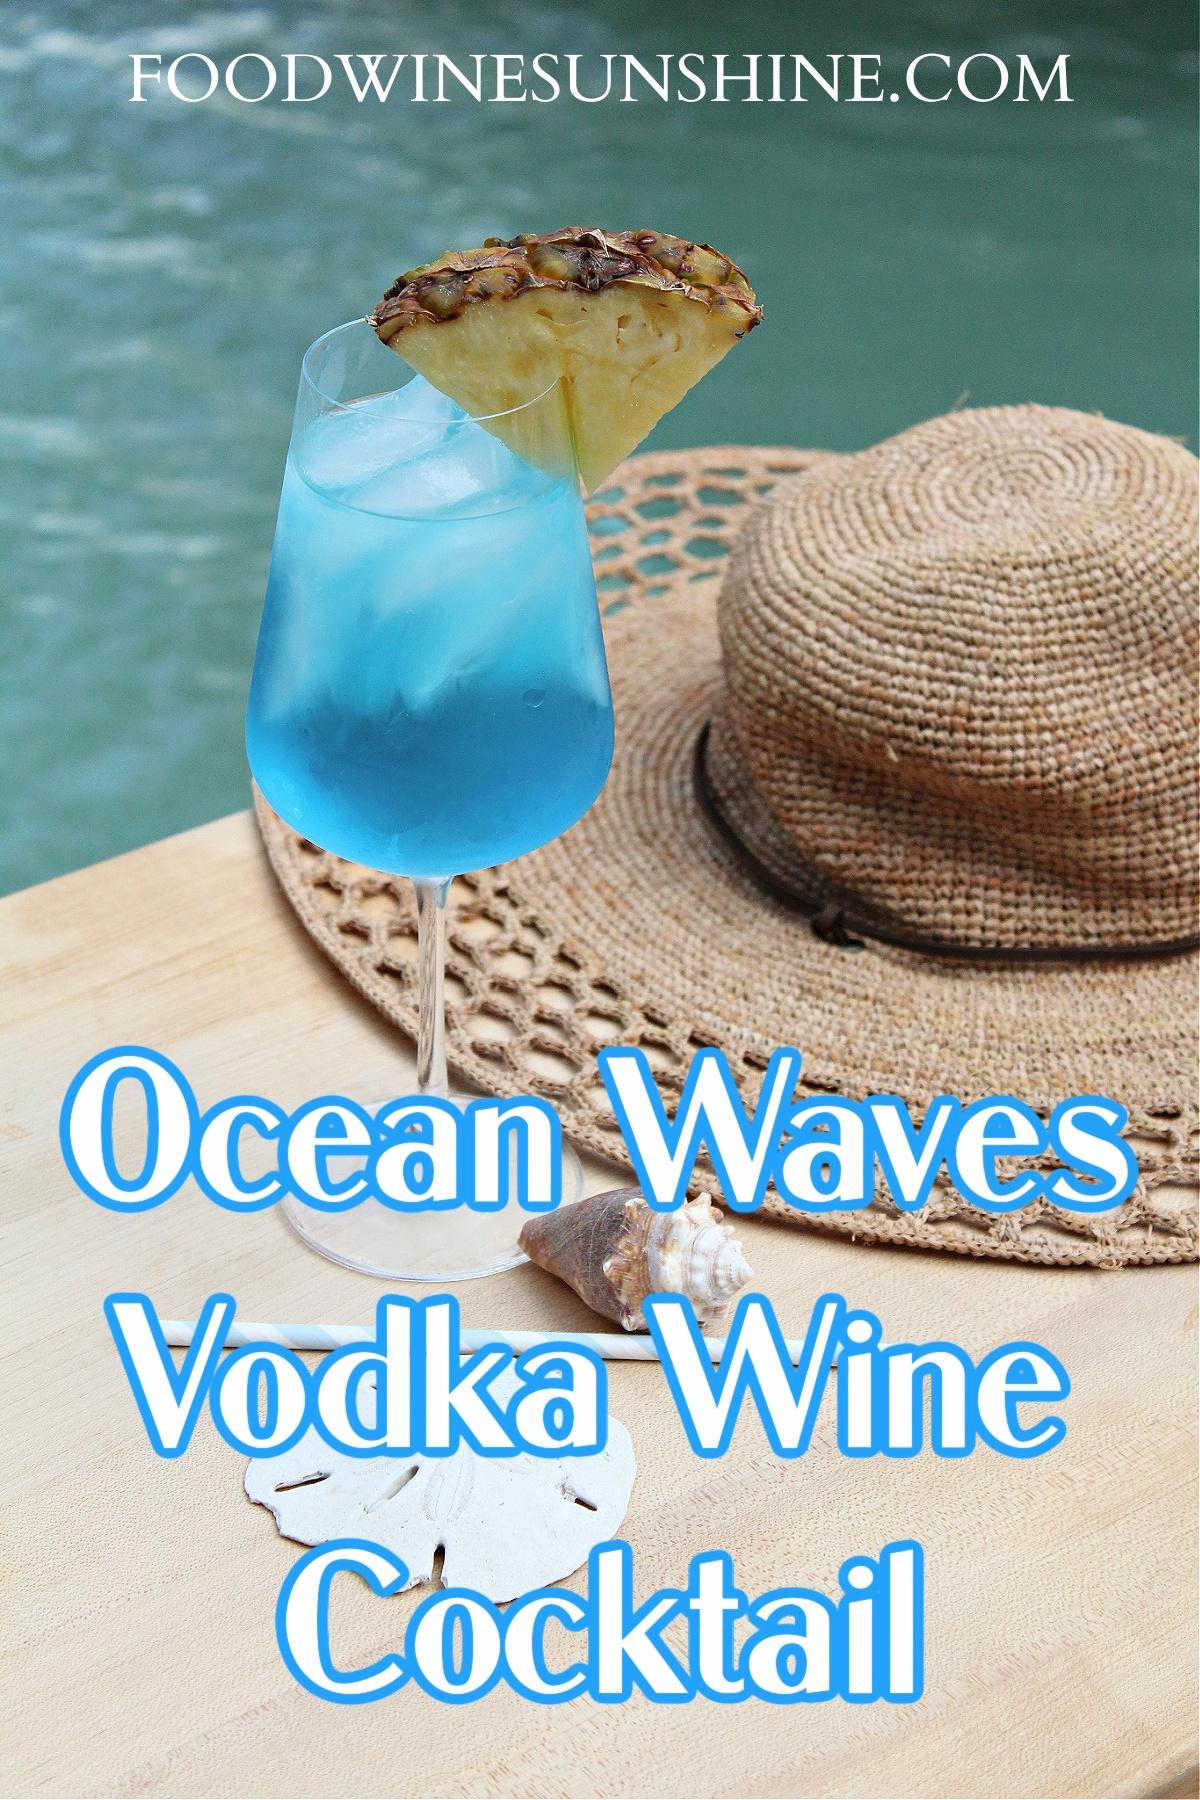 Ocean Waves Vodka Wine Cocktail